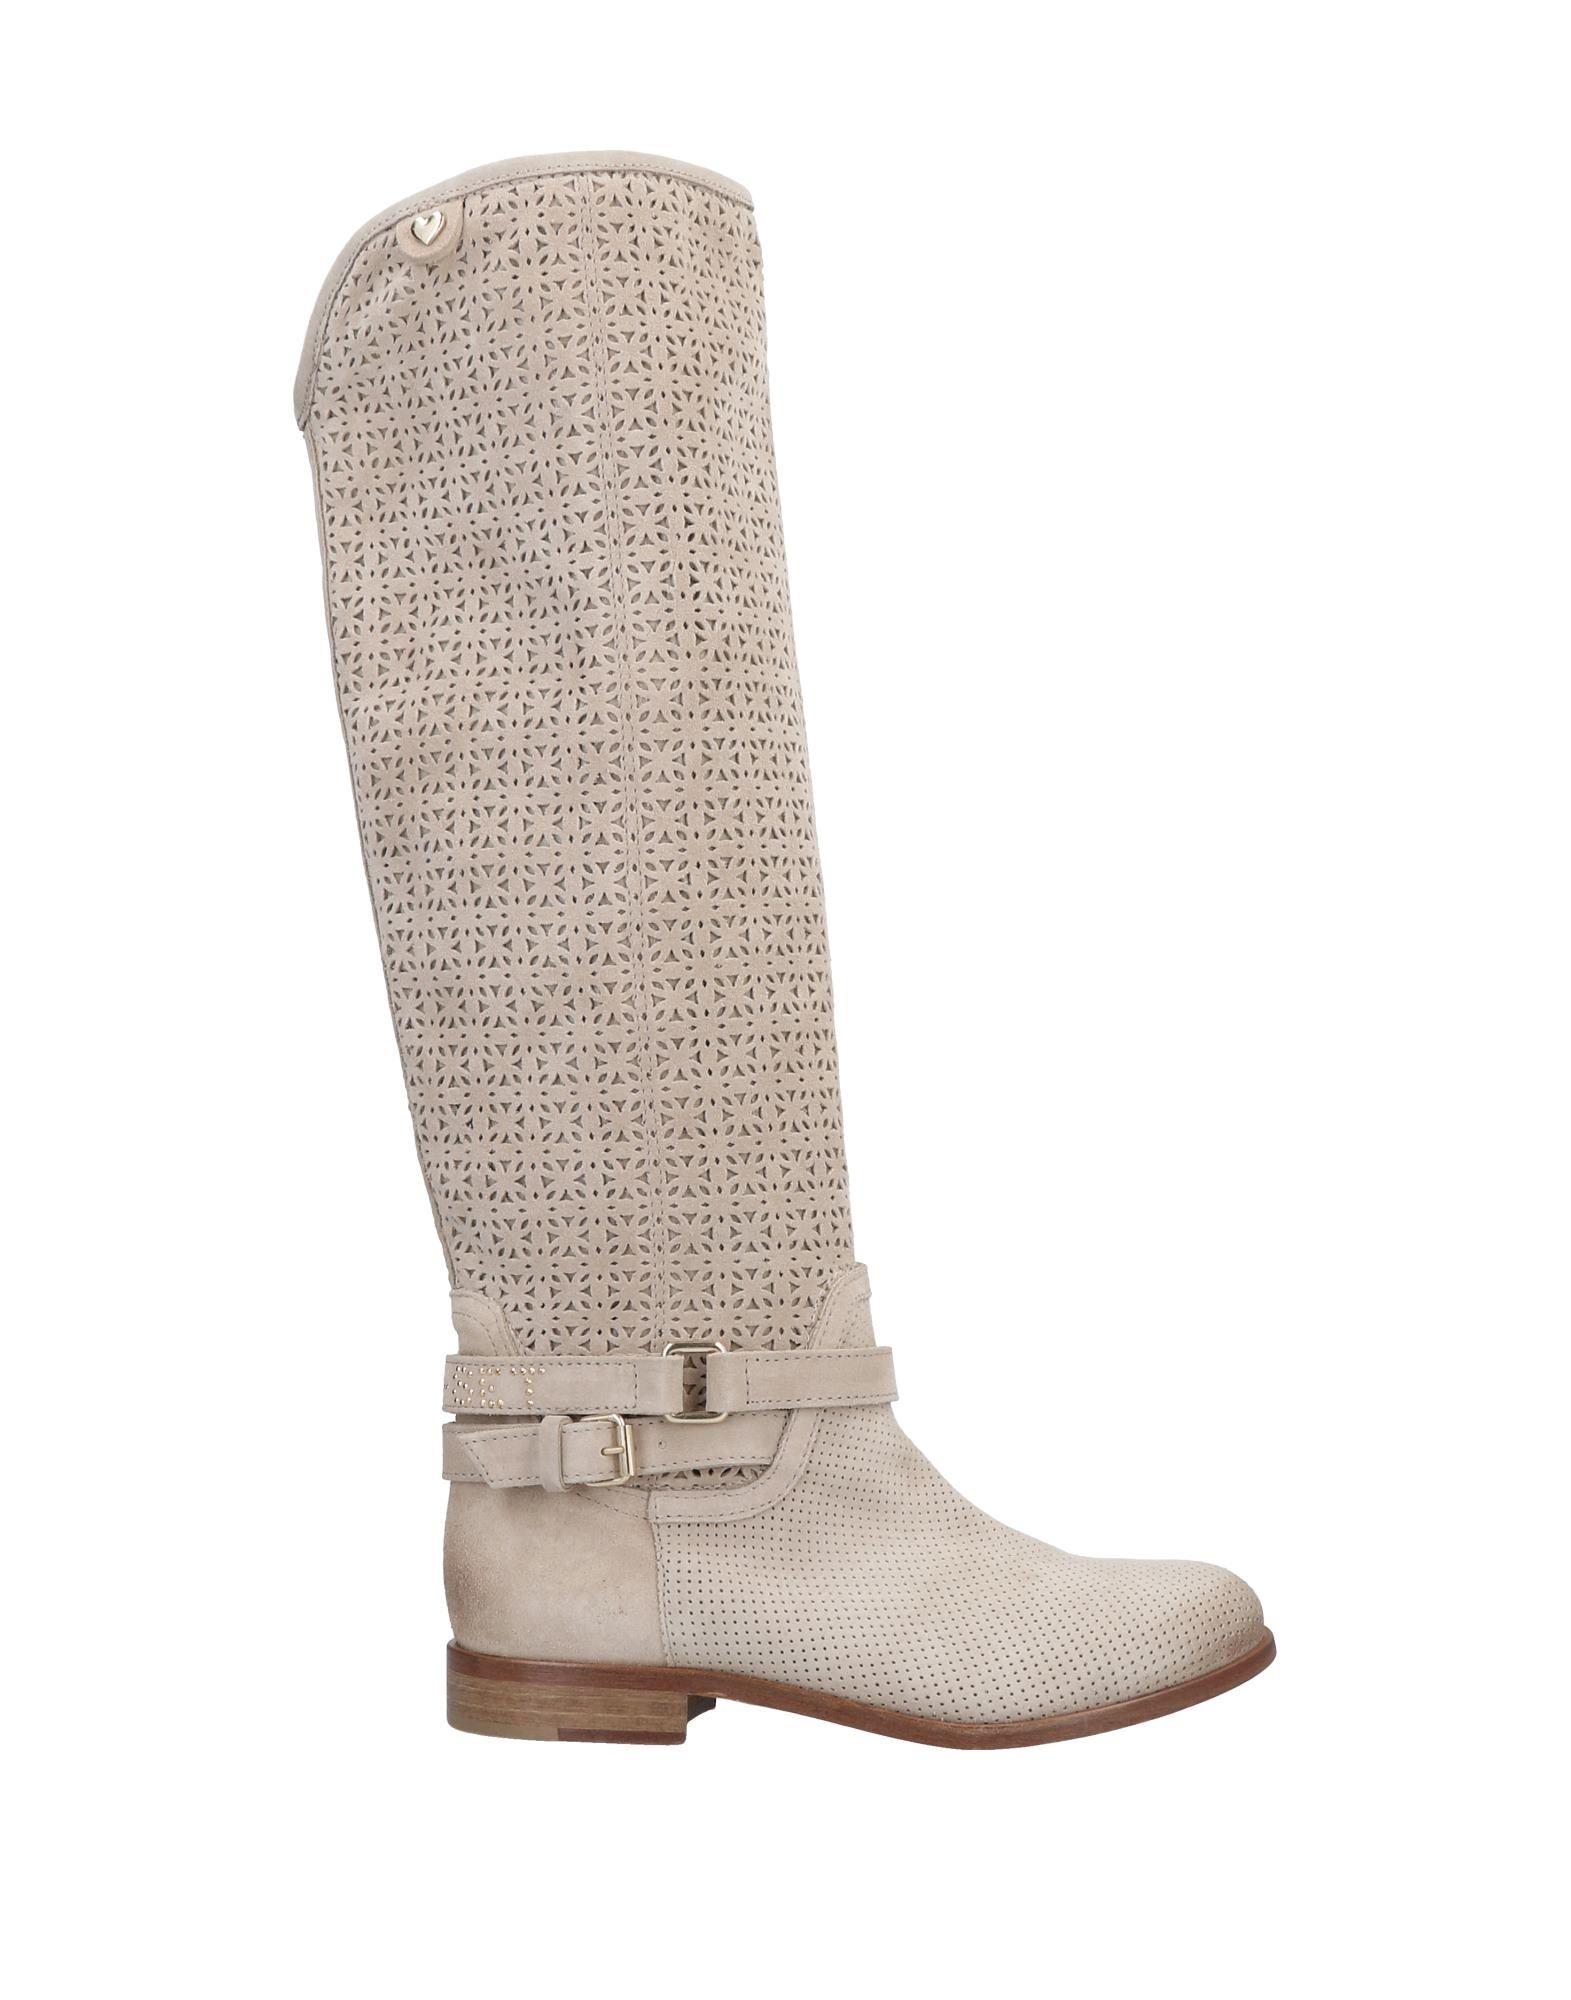 Twin-Set Women Simona Barbieri Boots - Women Twin-Set Twin-Set Simona Barbieri Boots online on  Canada - 11327113JA 1a37c2